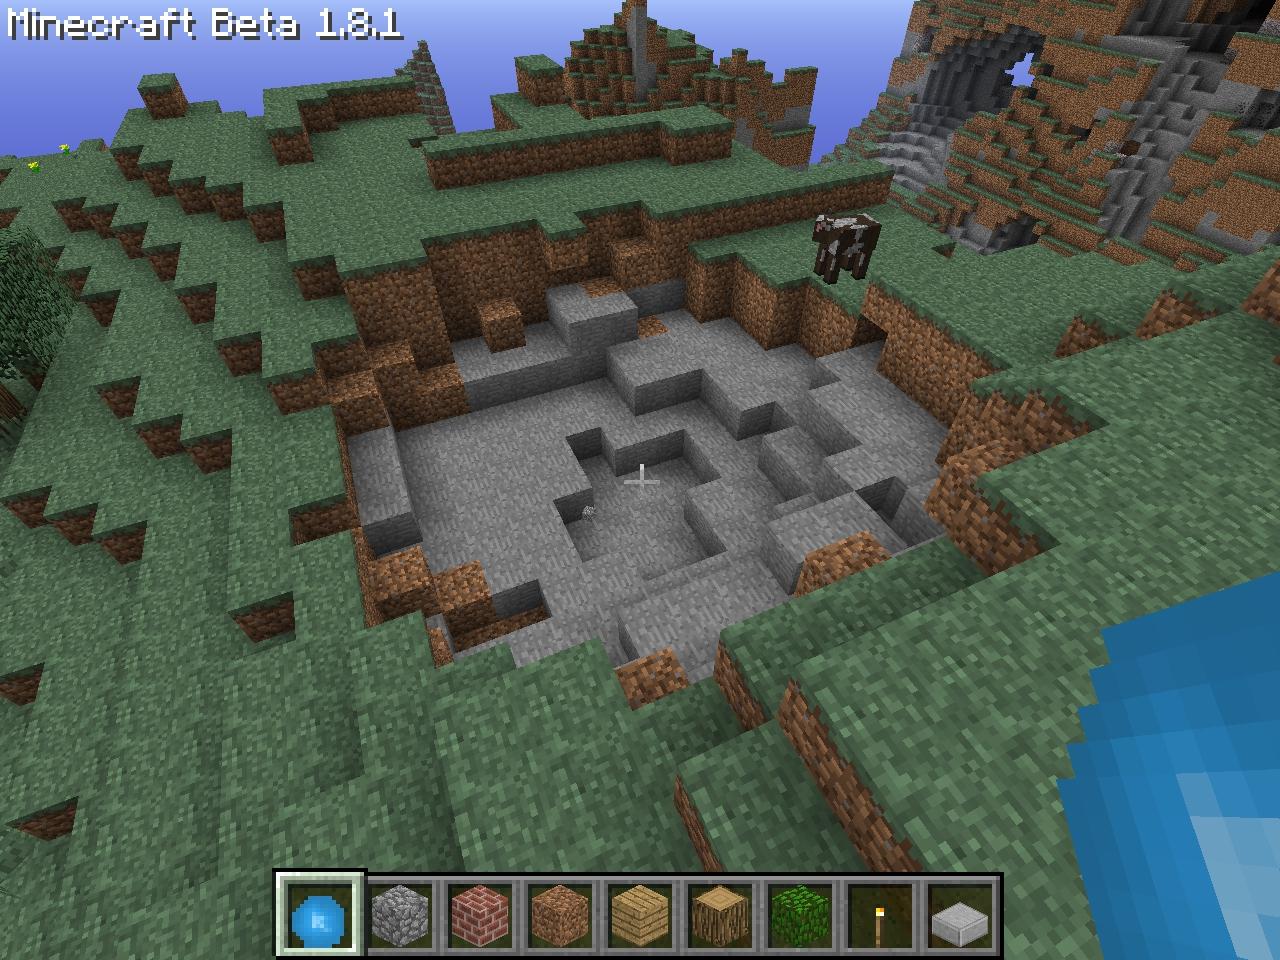 Mod Z Dragon Mod 2 Minecraft 54 1 Ball